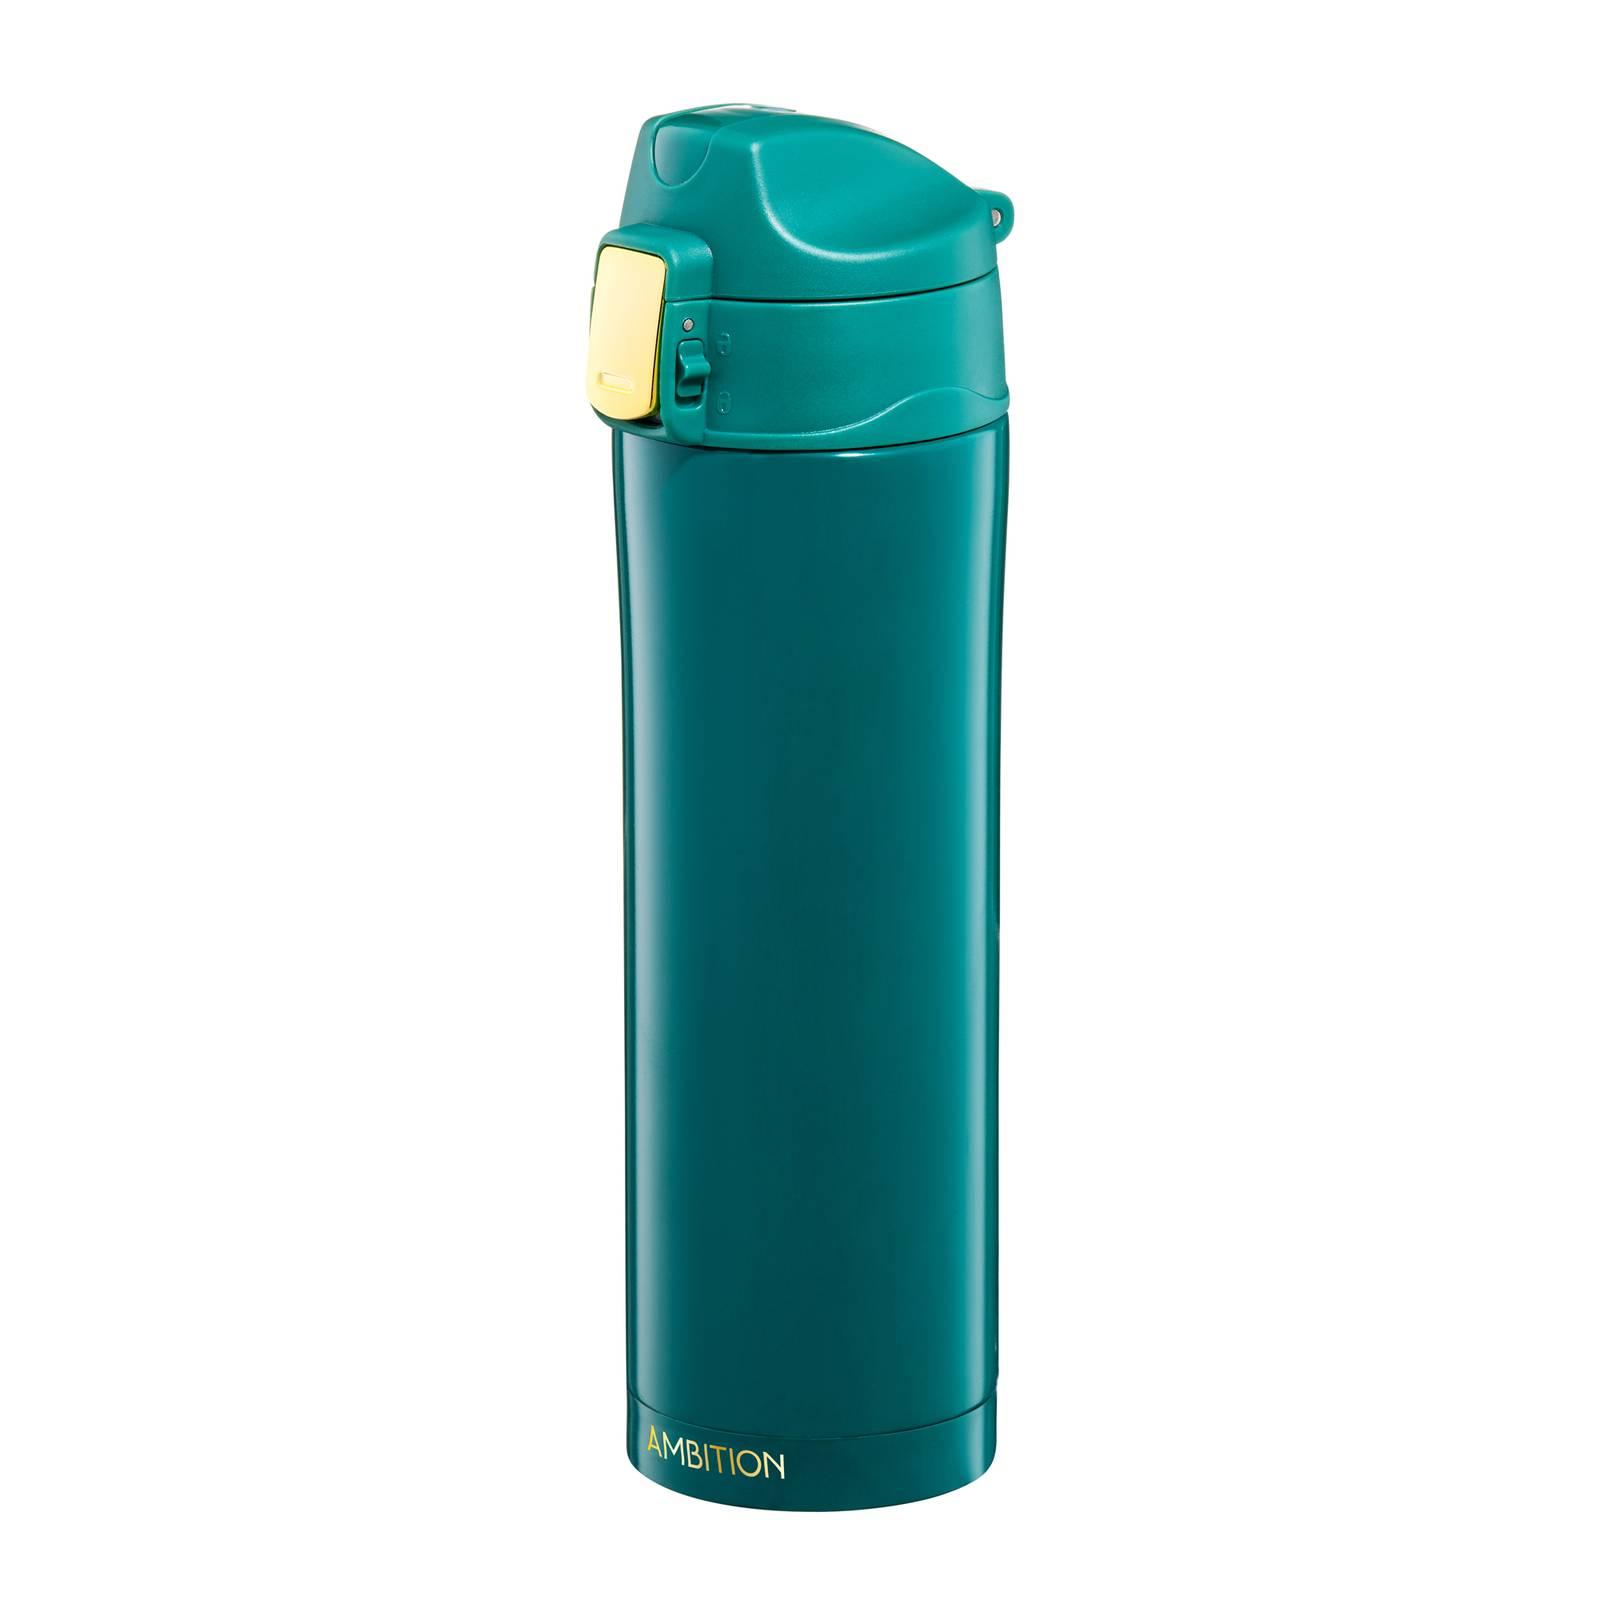 Thermobecher Royal grün 420 ml AMBITION